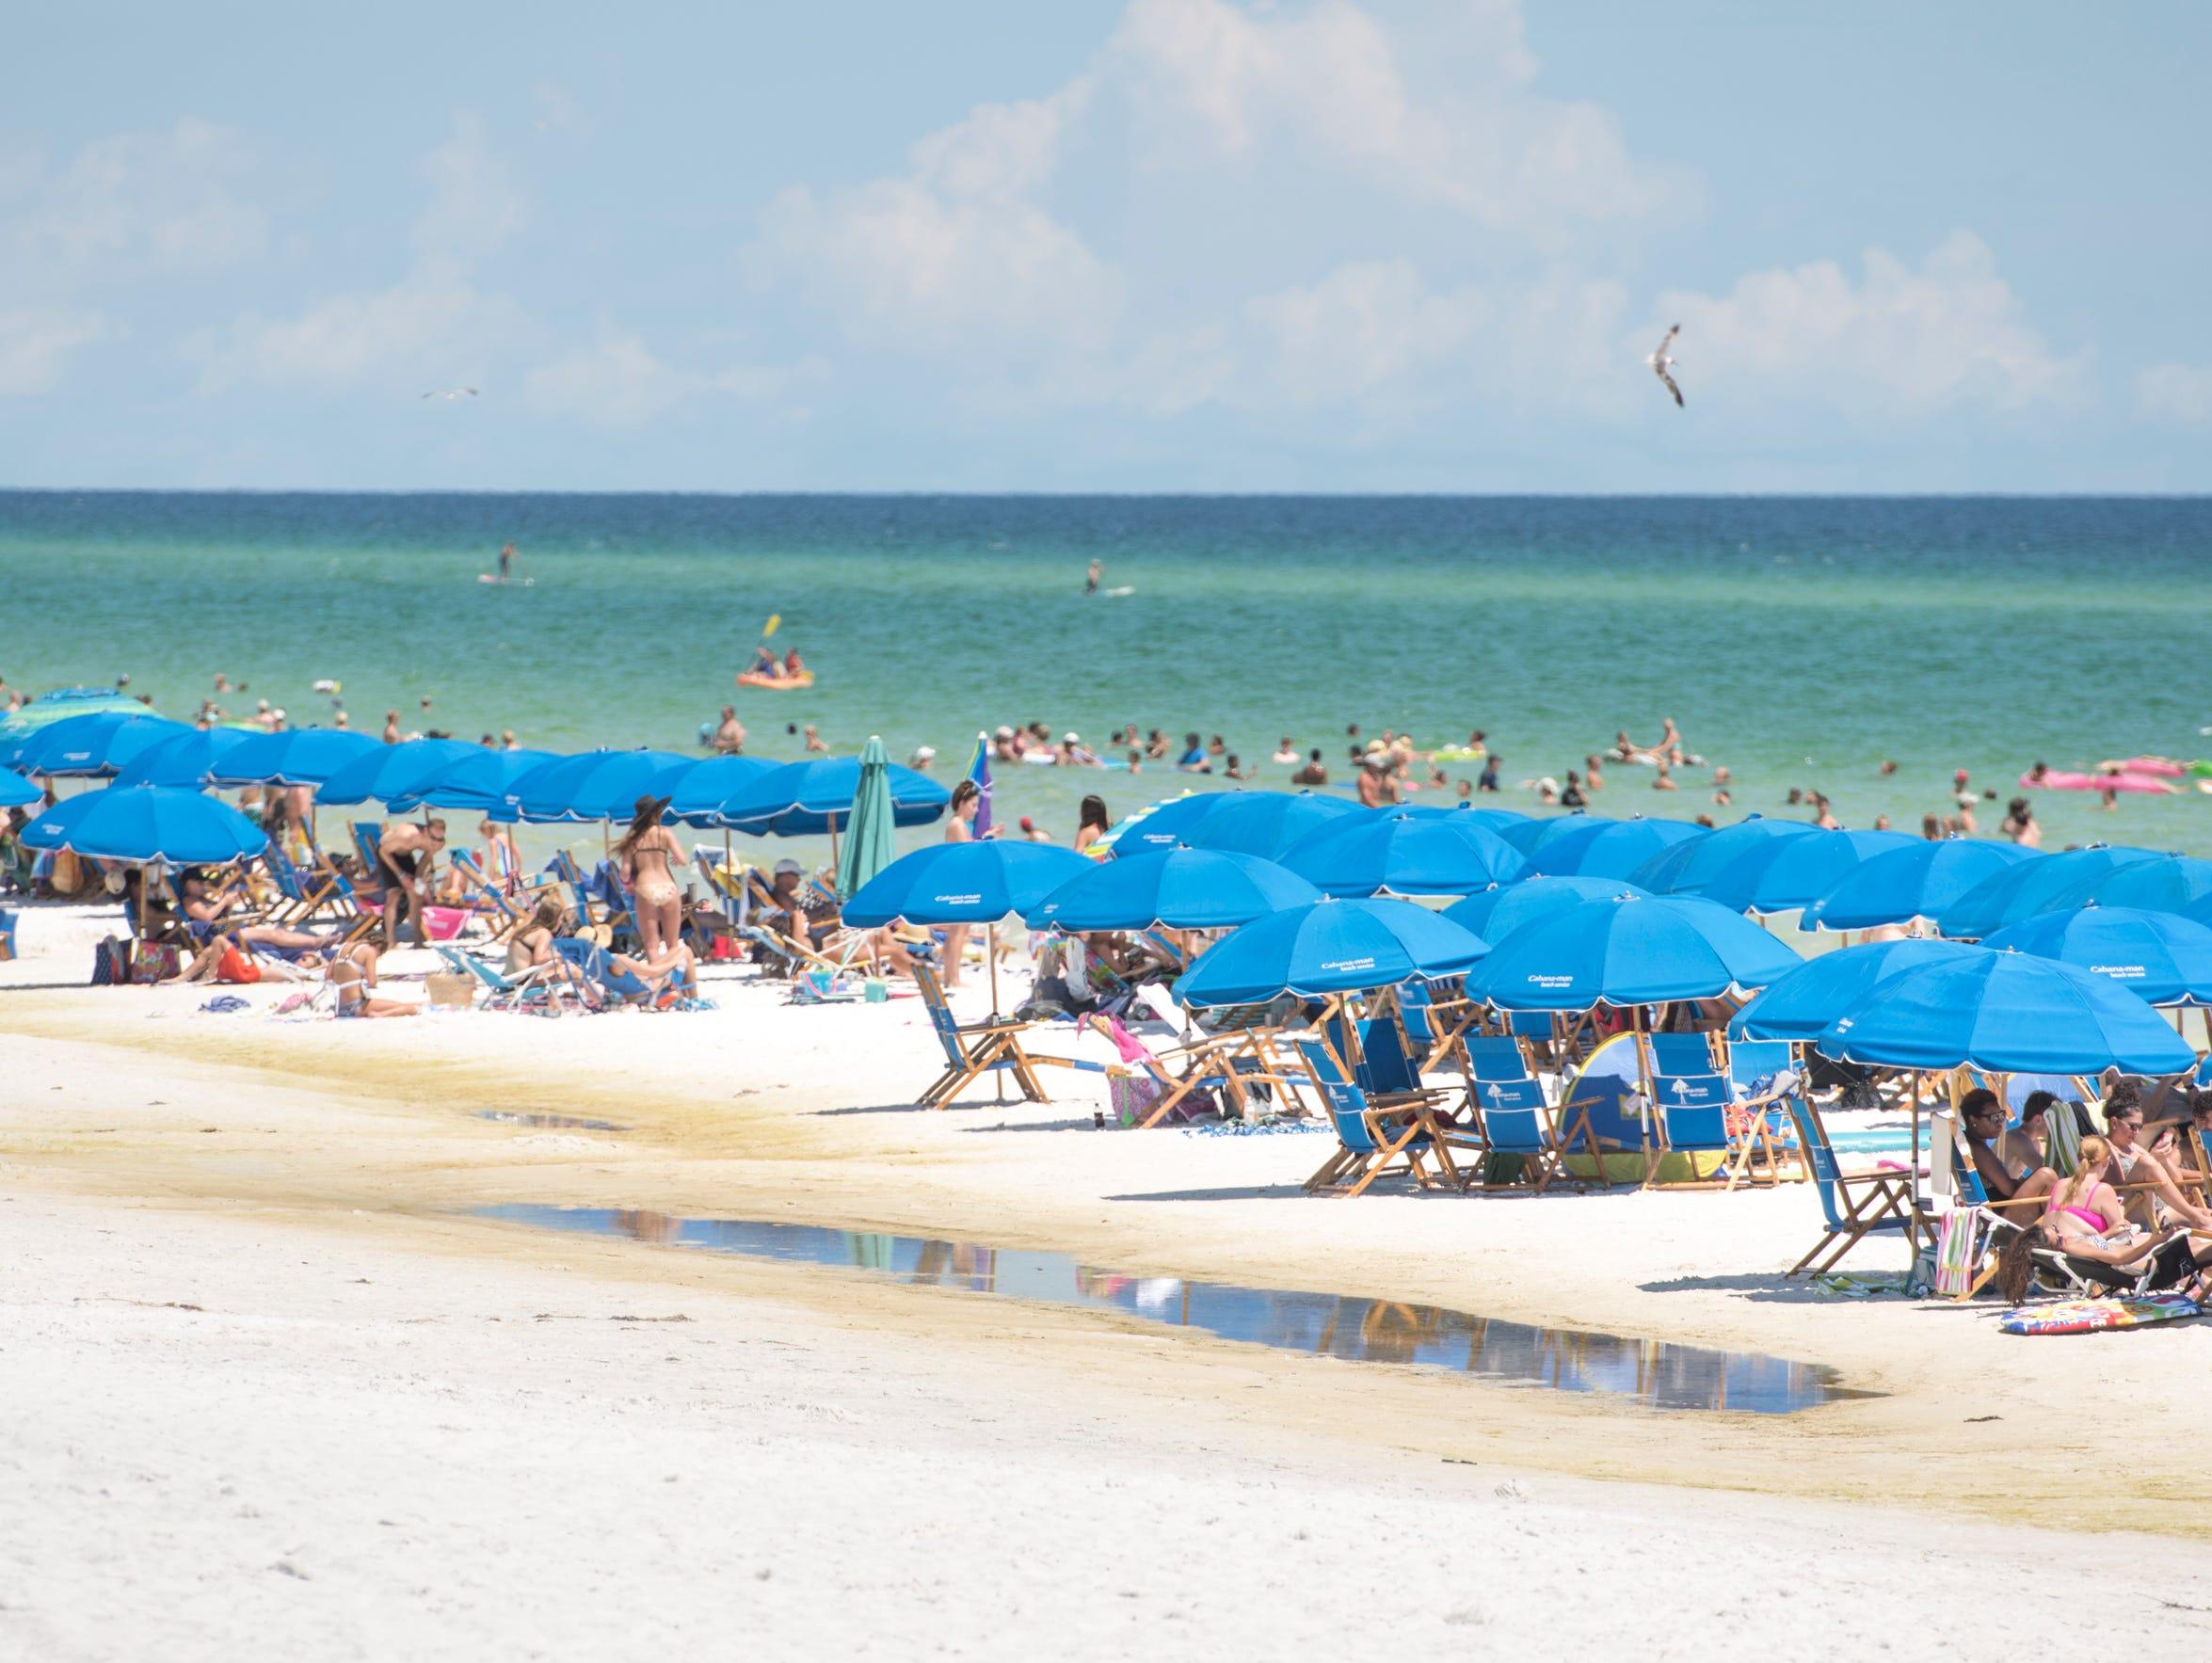 Beachgoers crowd the beach of Seaside in Walton County,